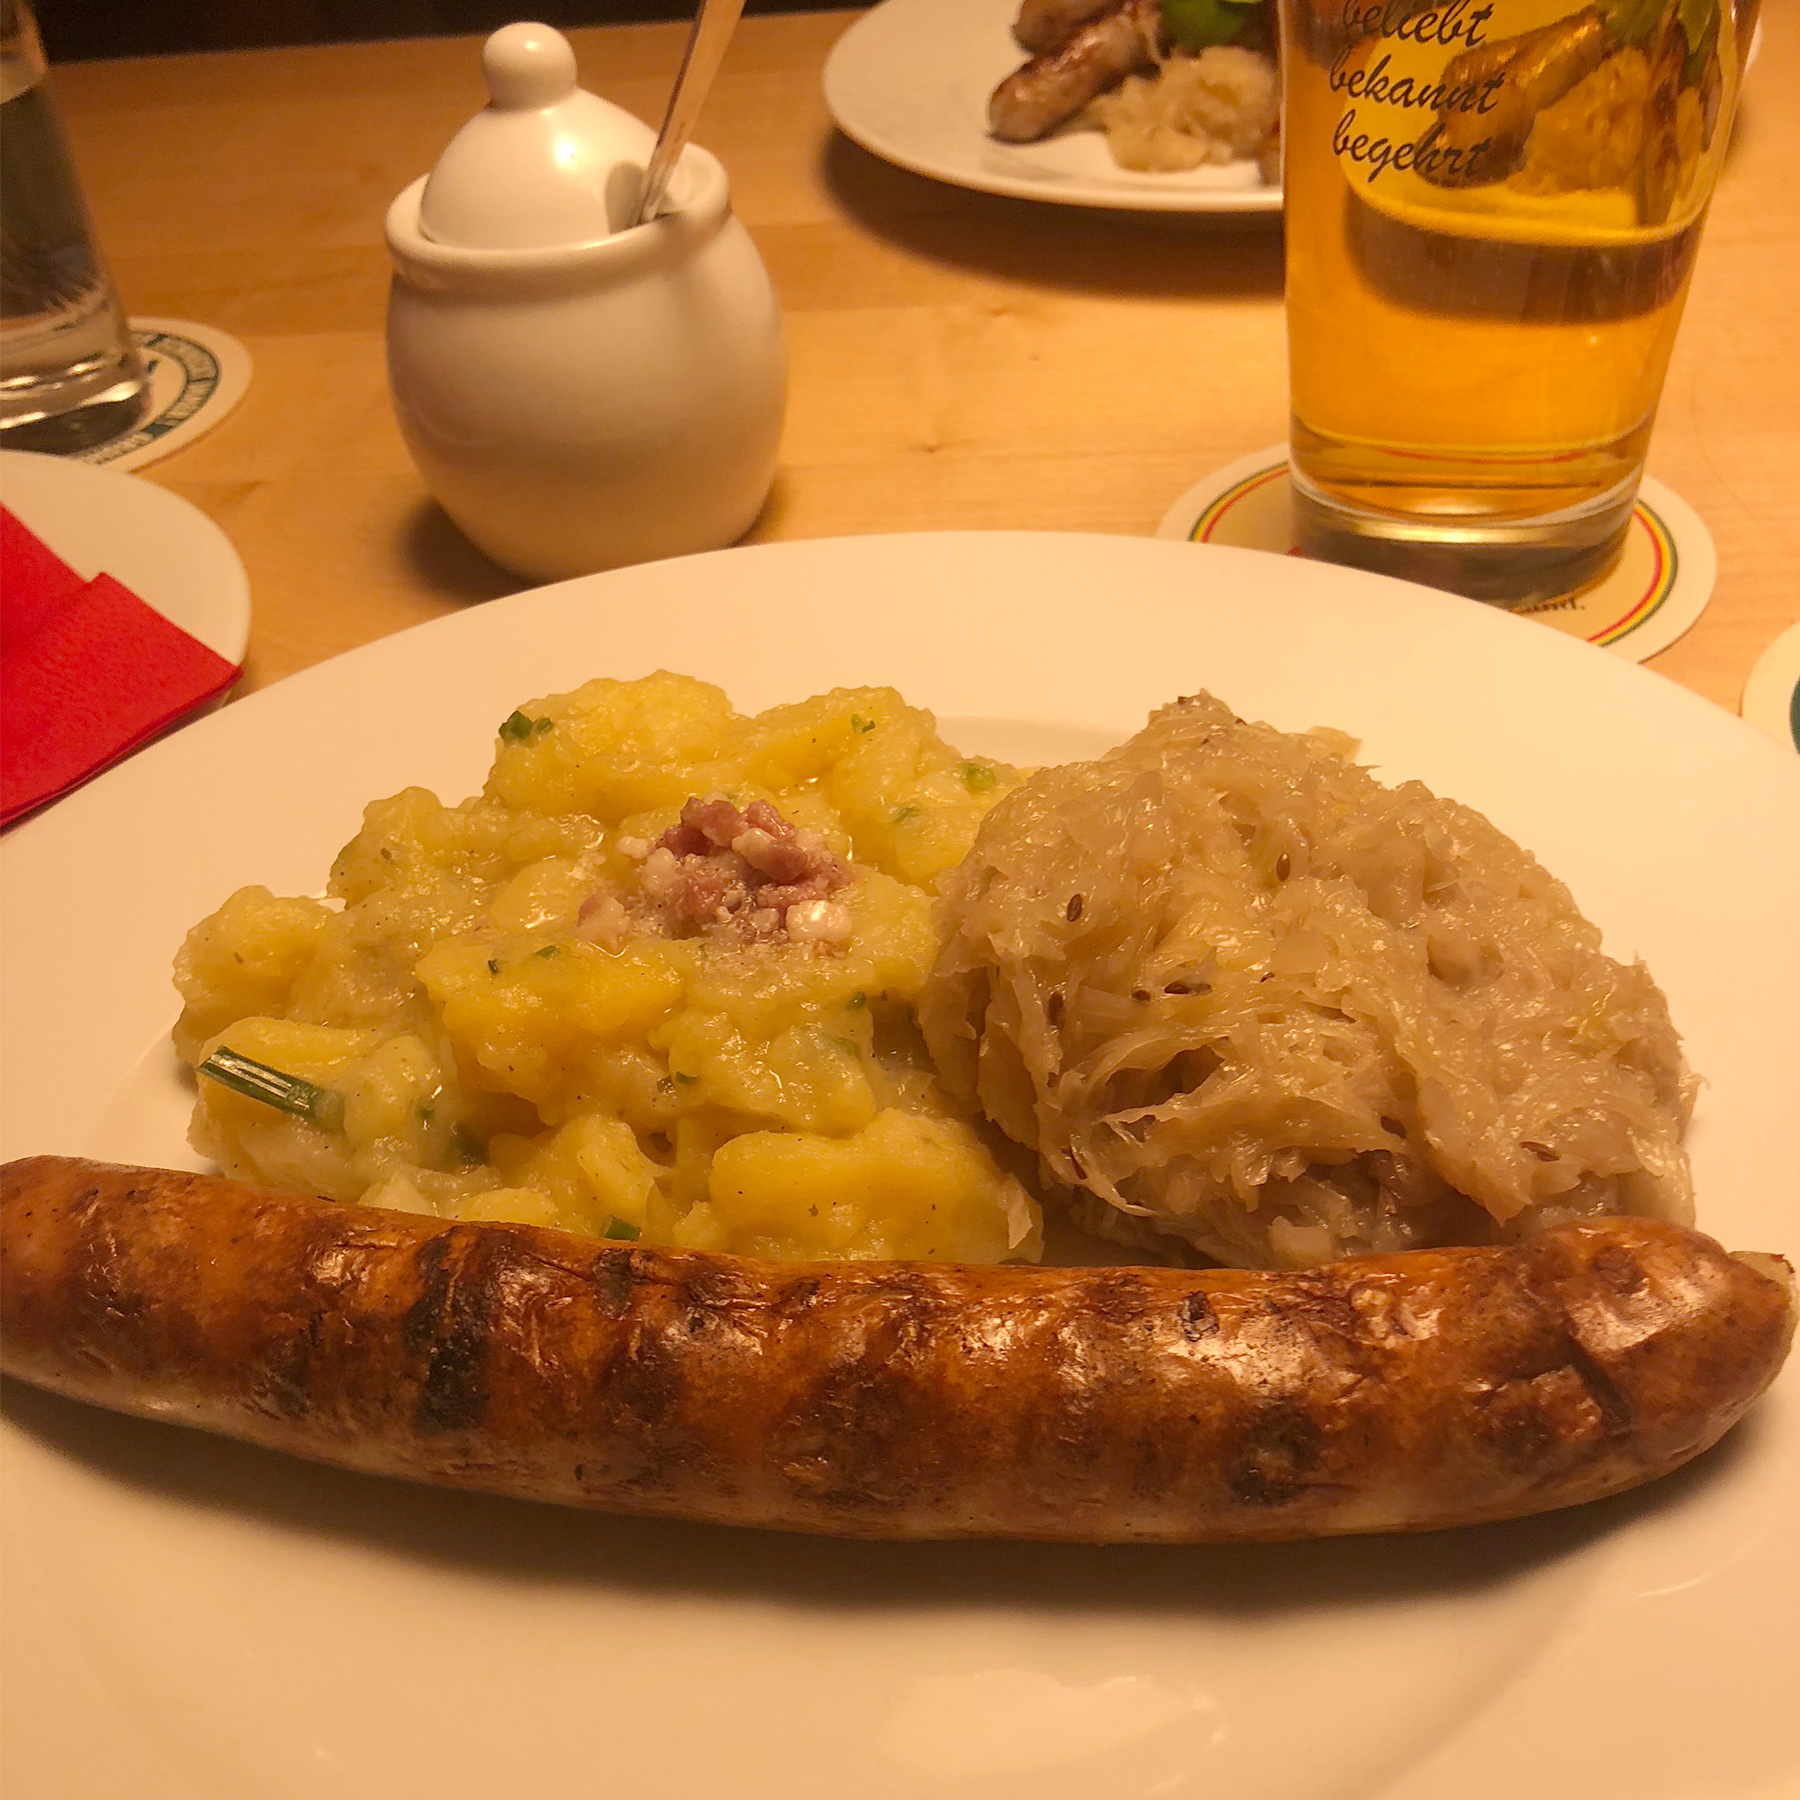 obigatory delicious bratwurst and sauerkraut